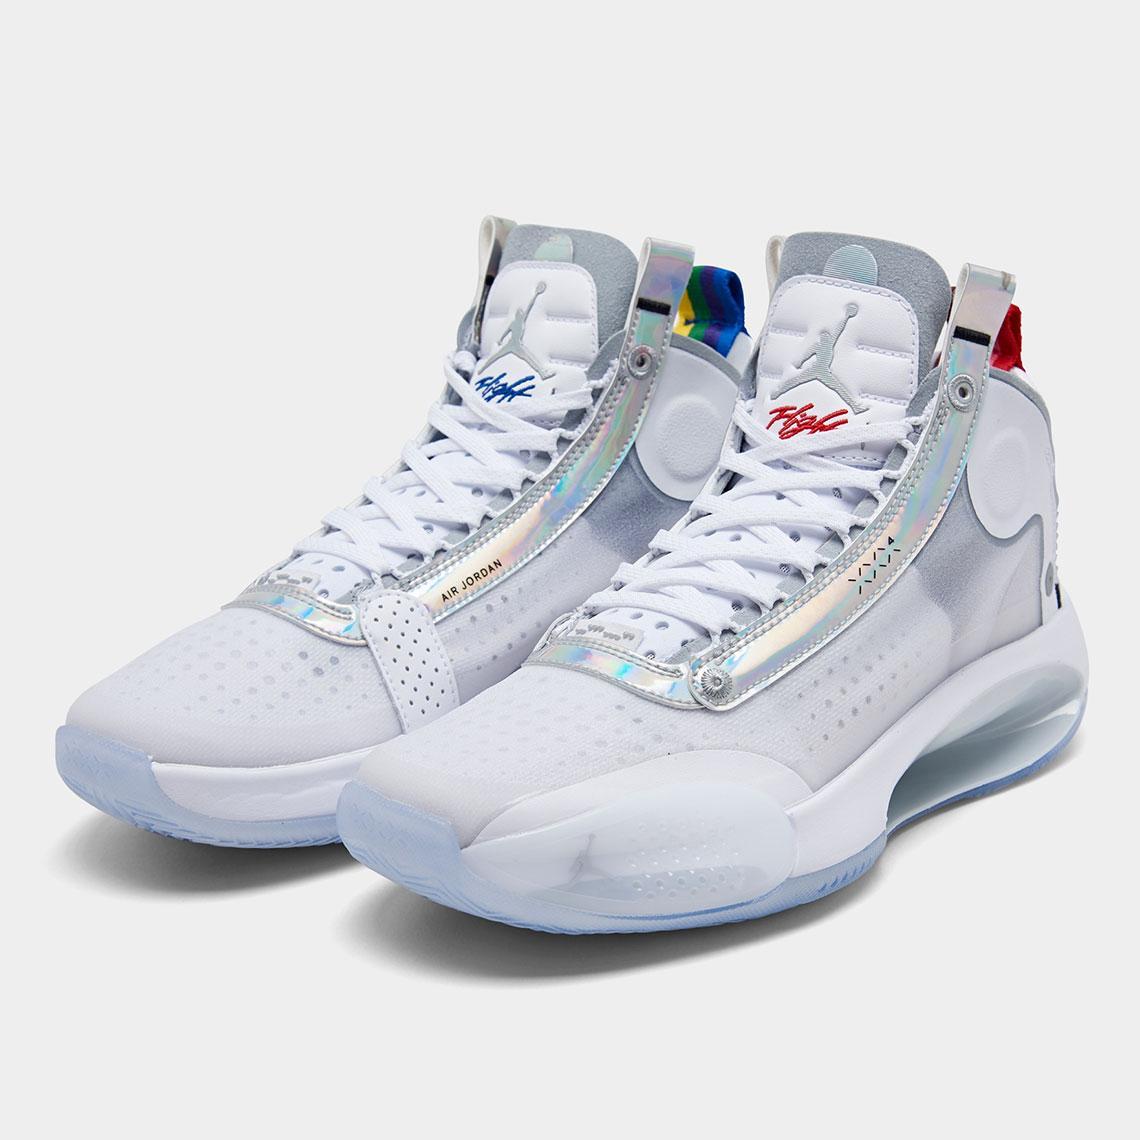 """AIR JORDAN 34 White Iridescent"" รองเท้า Air Jordan ที่เบาที่สุดที่เคยผลิตออกมา 05"